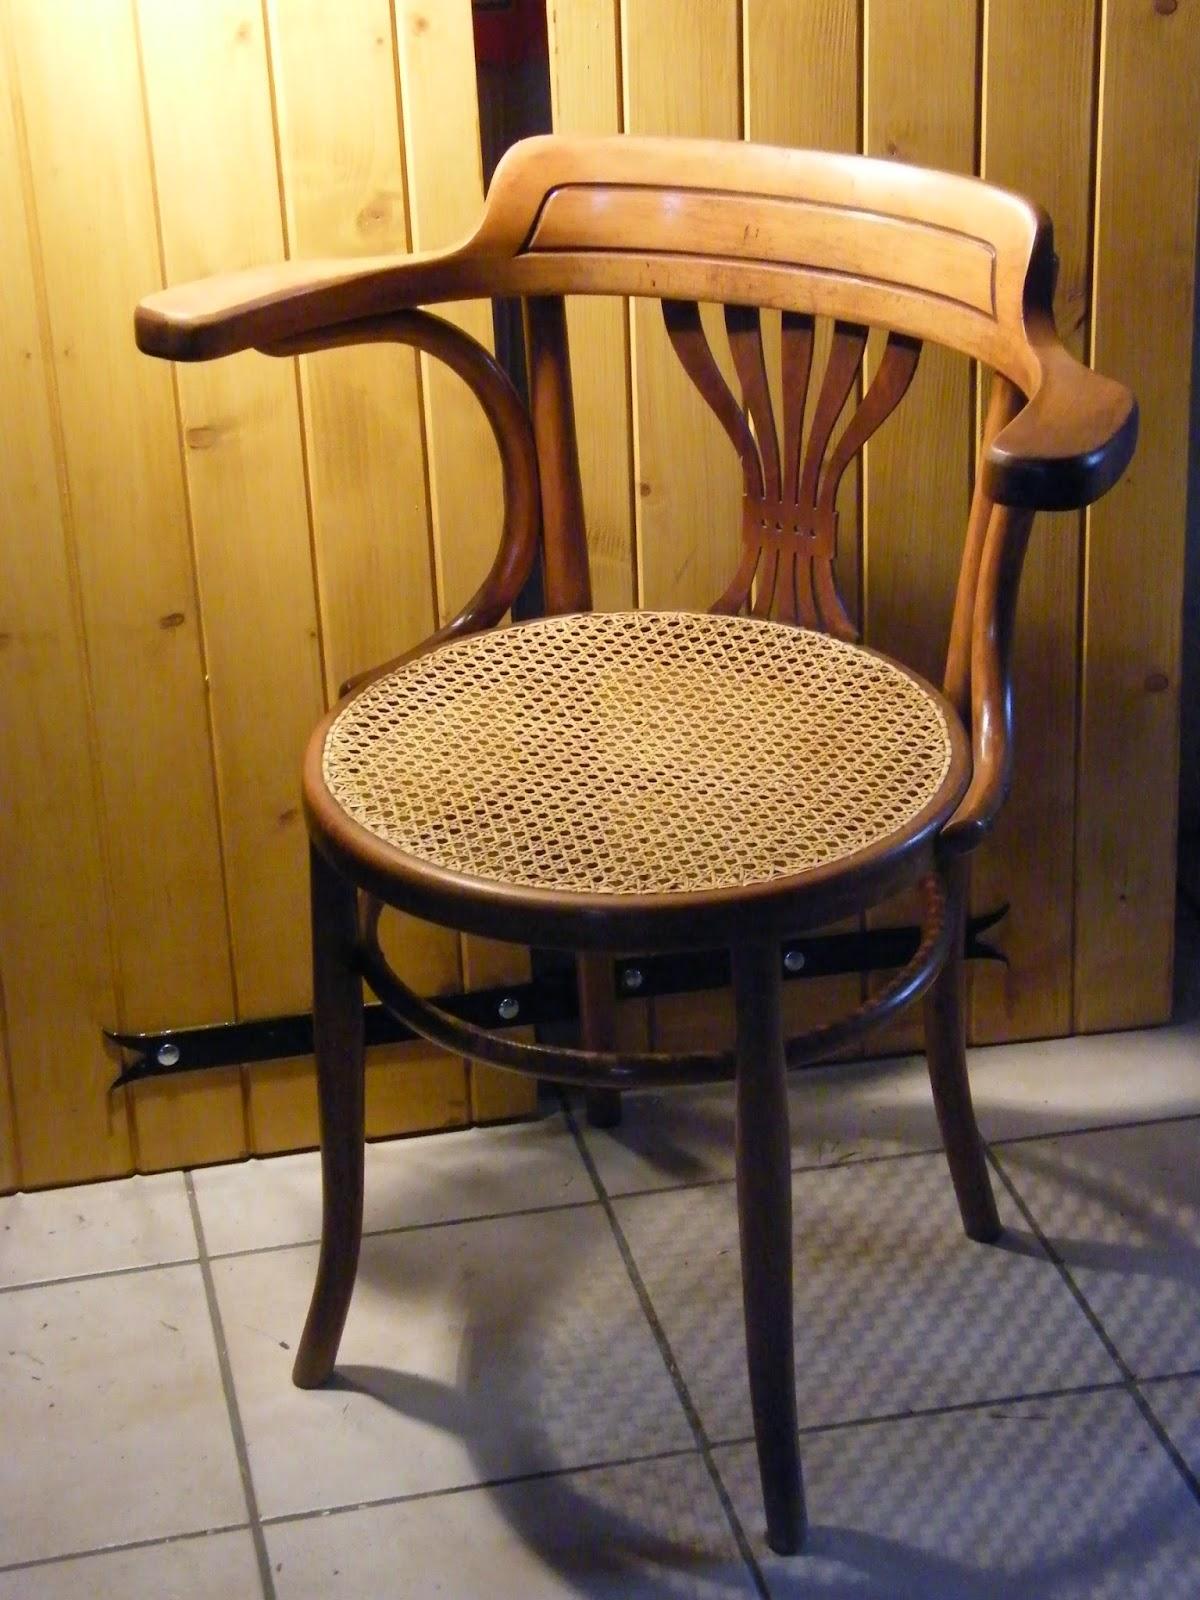 normandie cannage fauteuil de bureau cann. Black Bedroom Furniture Sets. Home Design Ideas